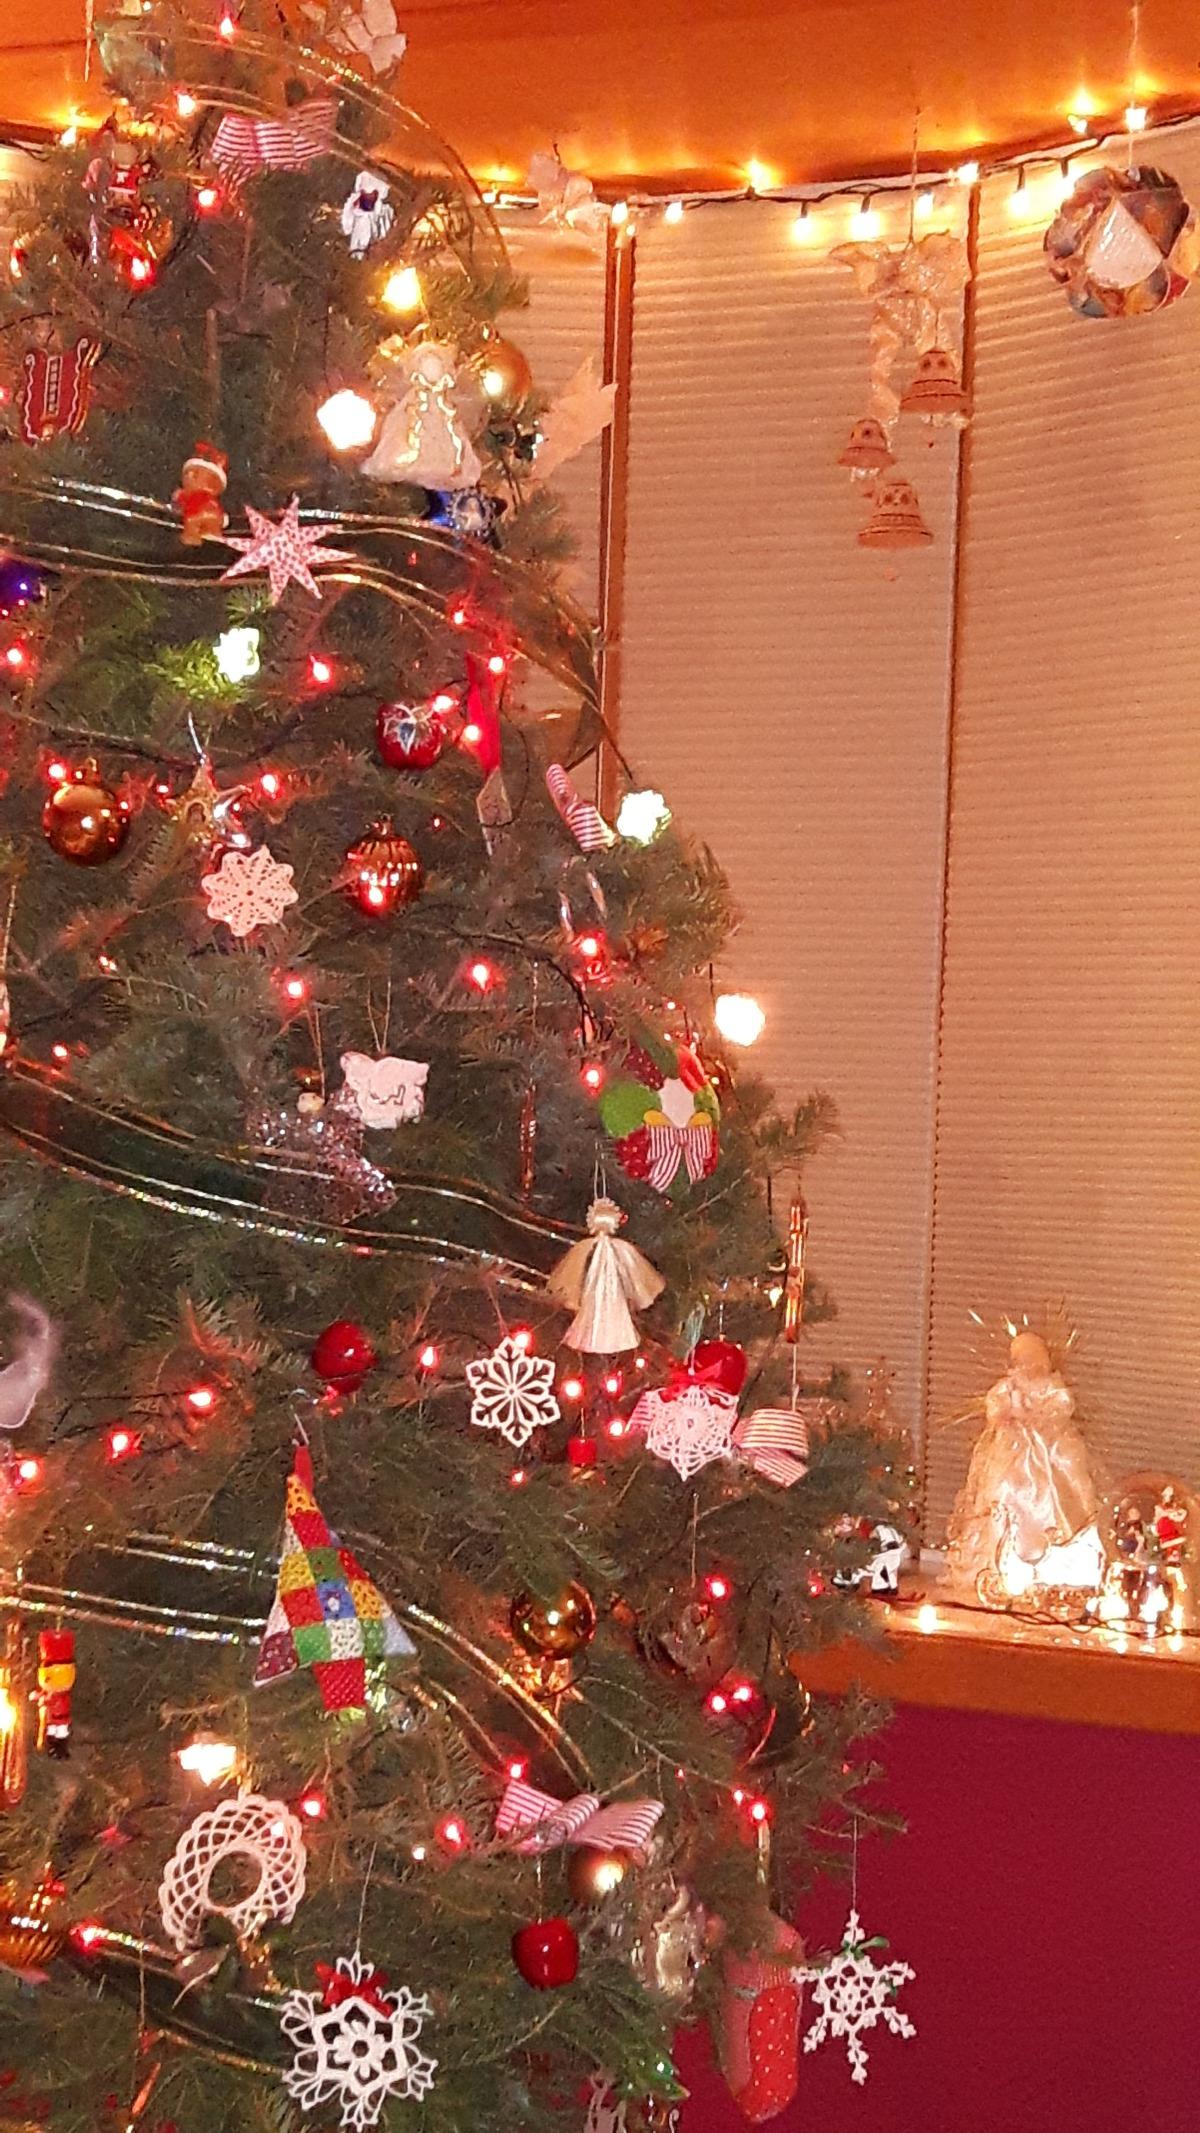 A Black Christmas inLondon